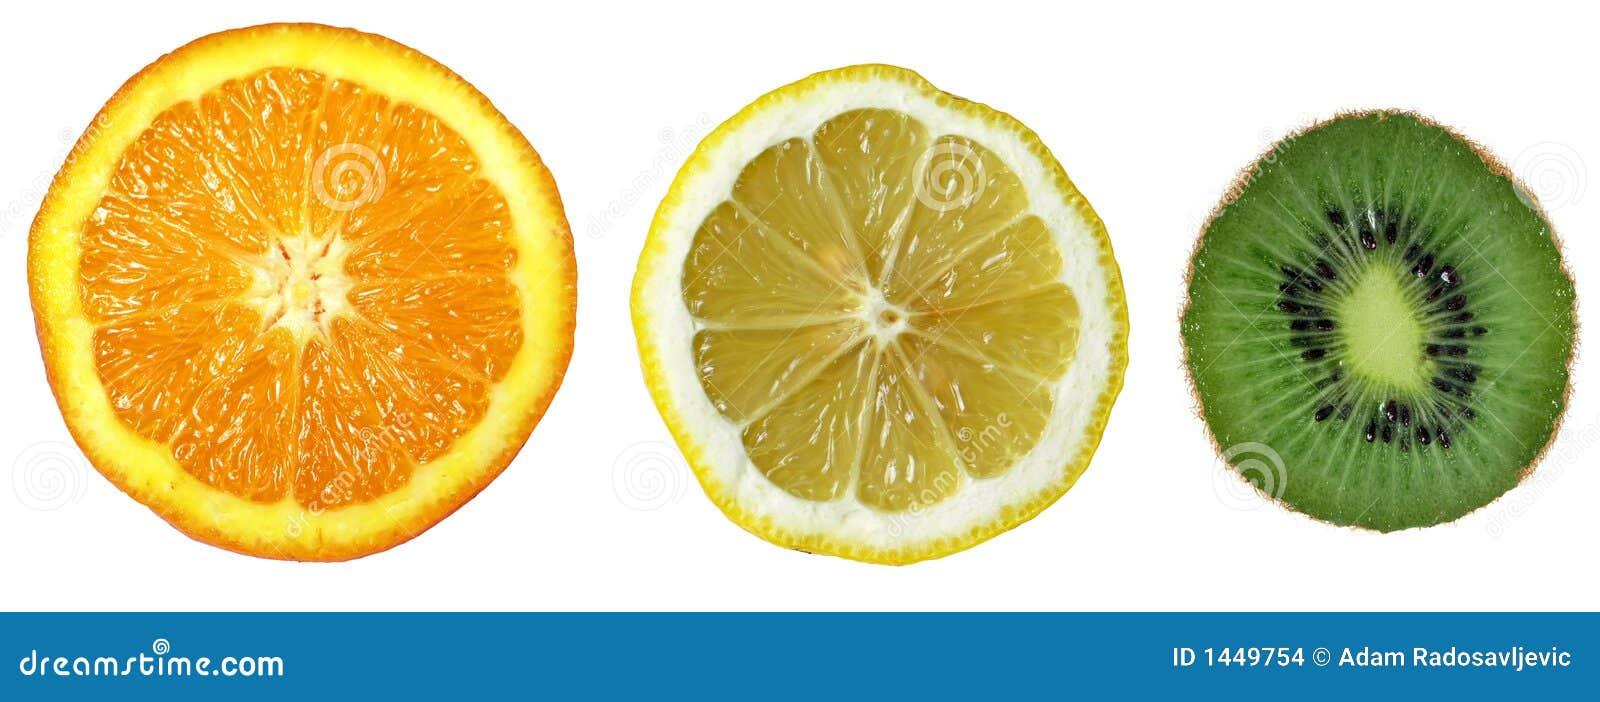 kruising citroen sinaasappel